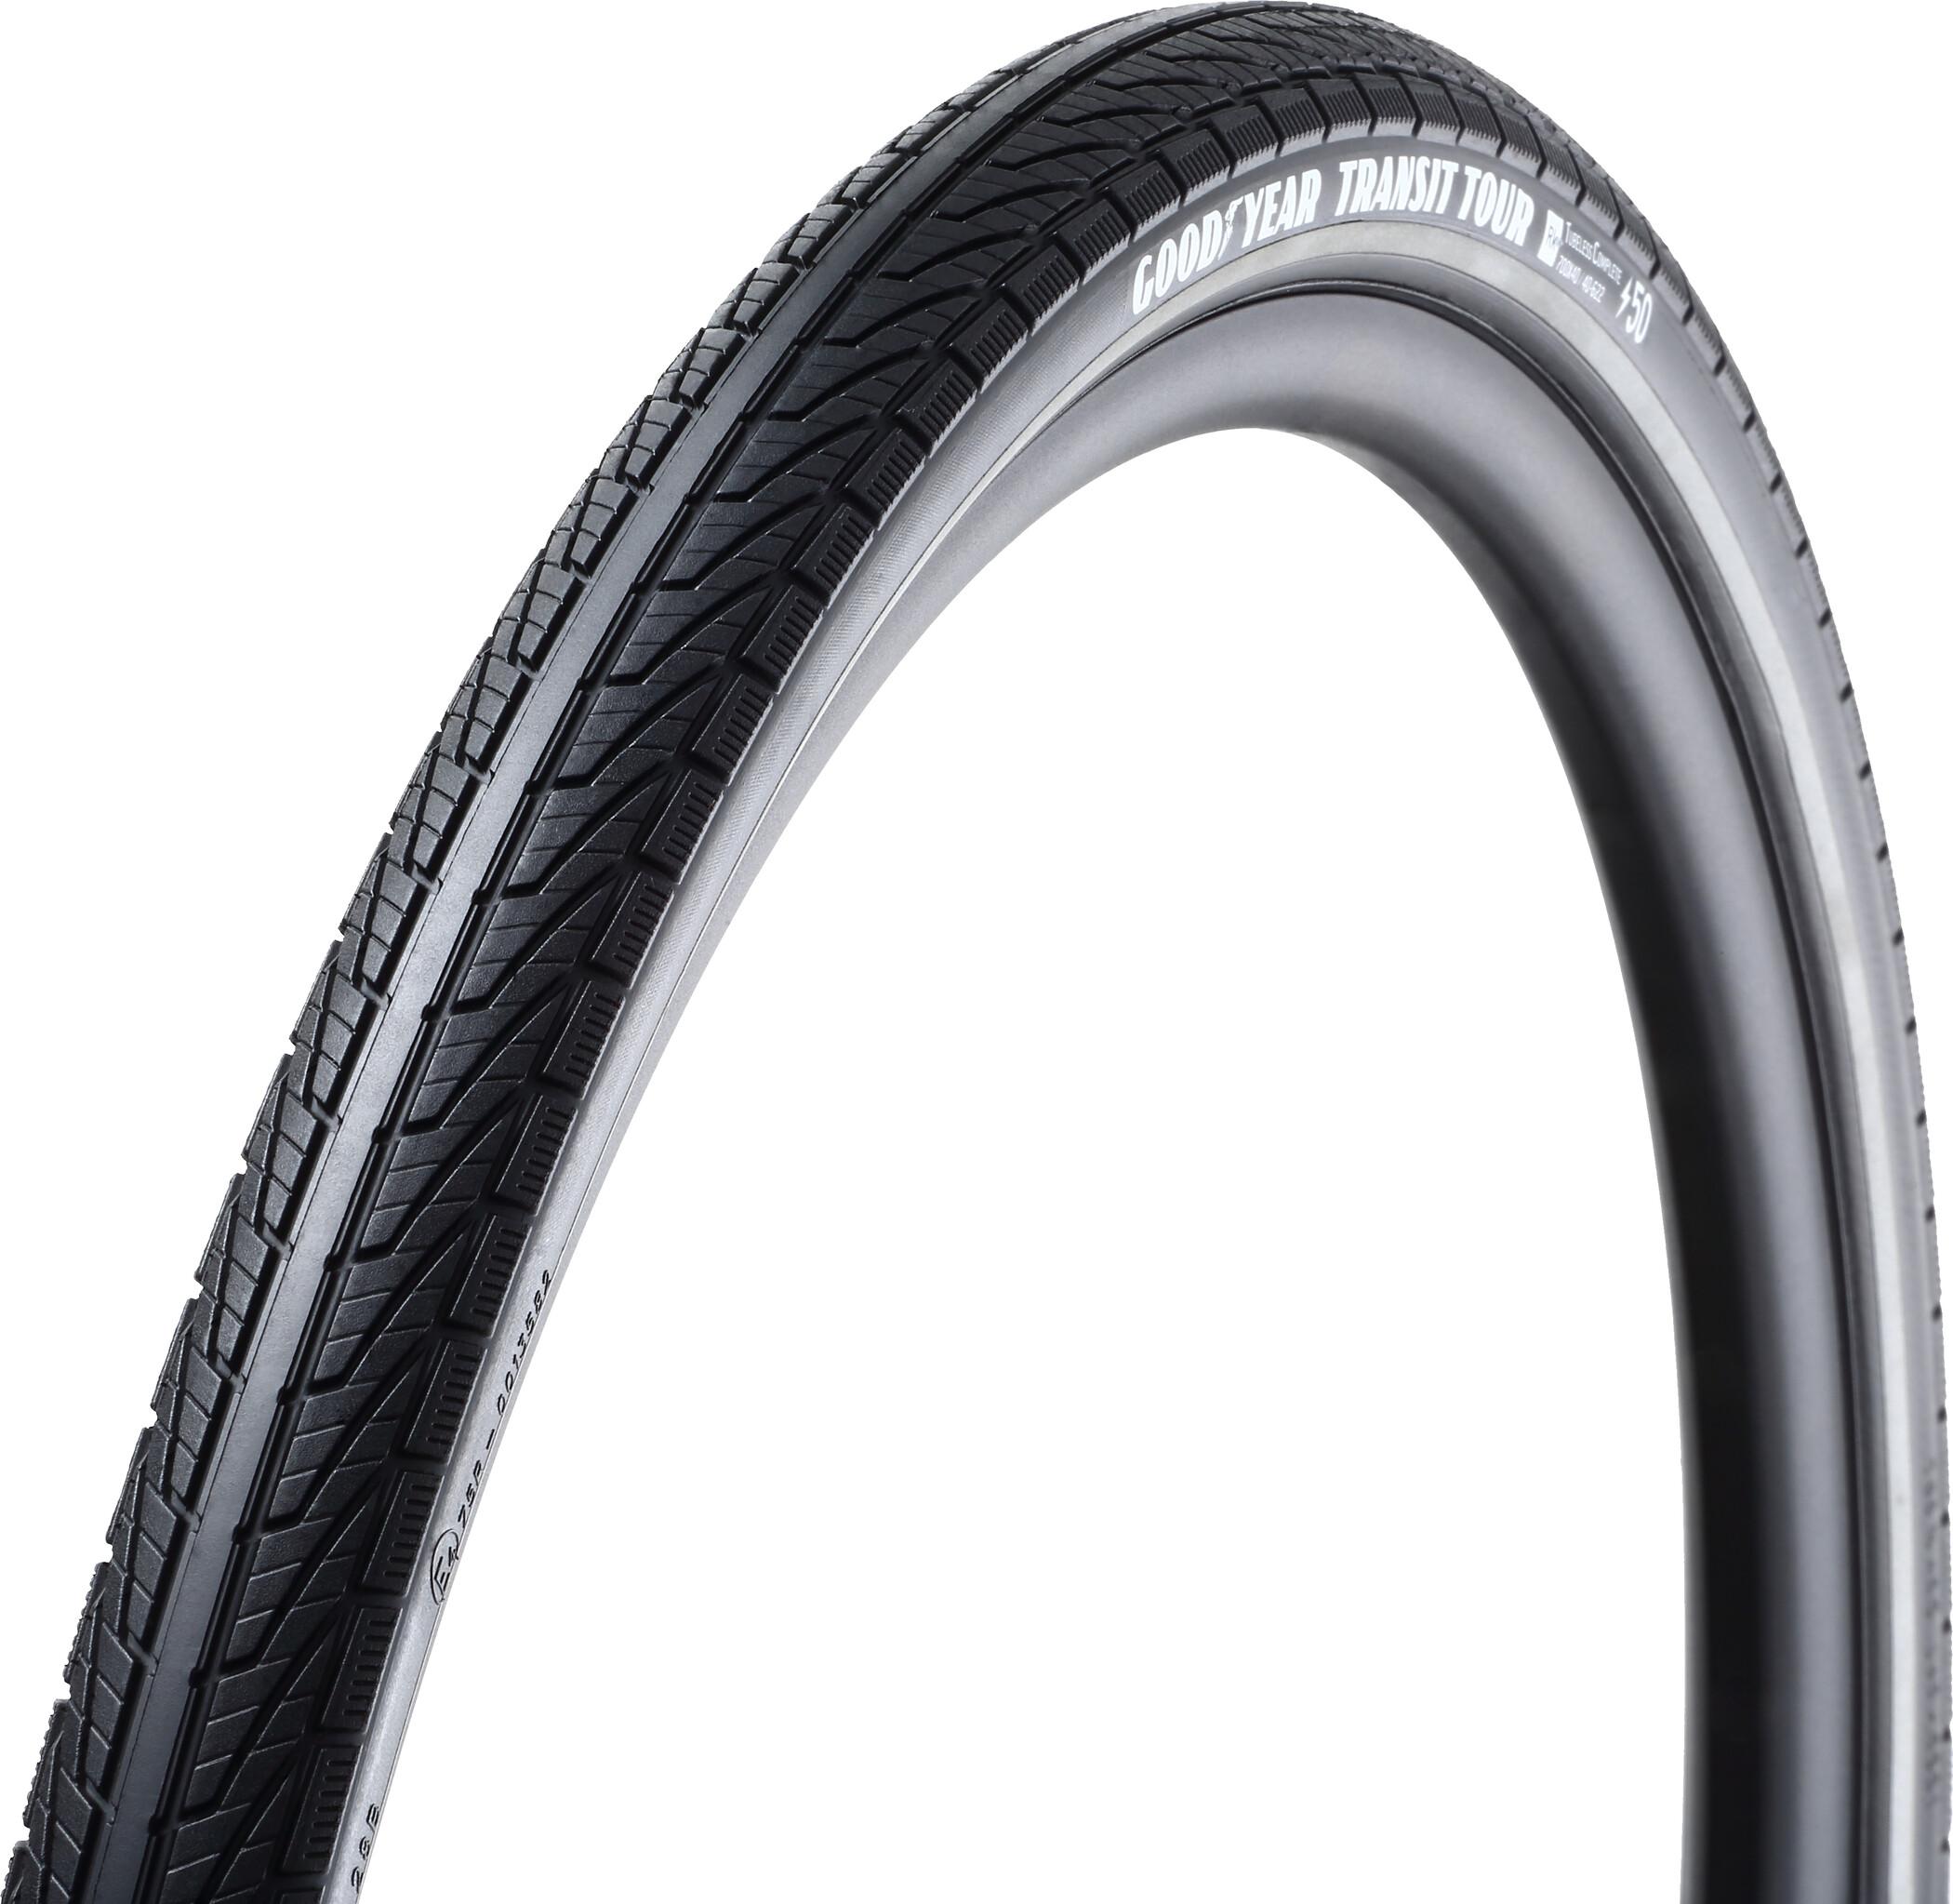 Goodyear Transit Tour Dæk 50-622 Secure e50, black reflected (2019)   Tyres